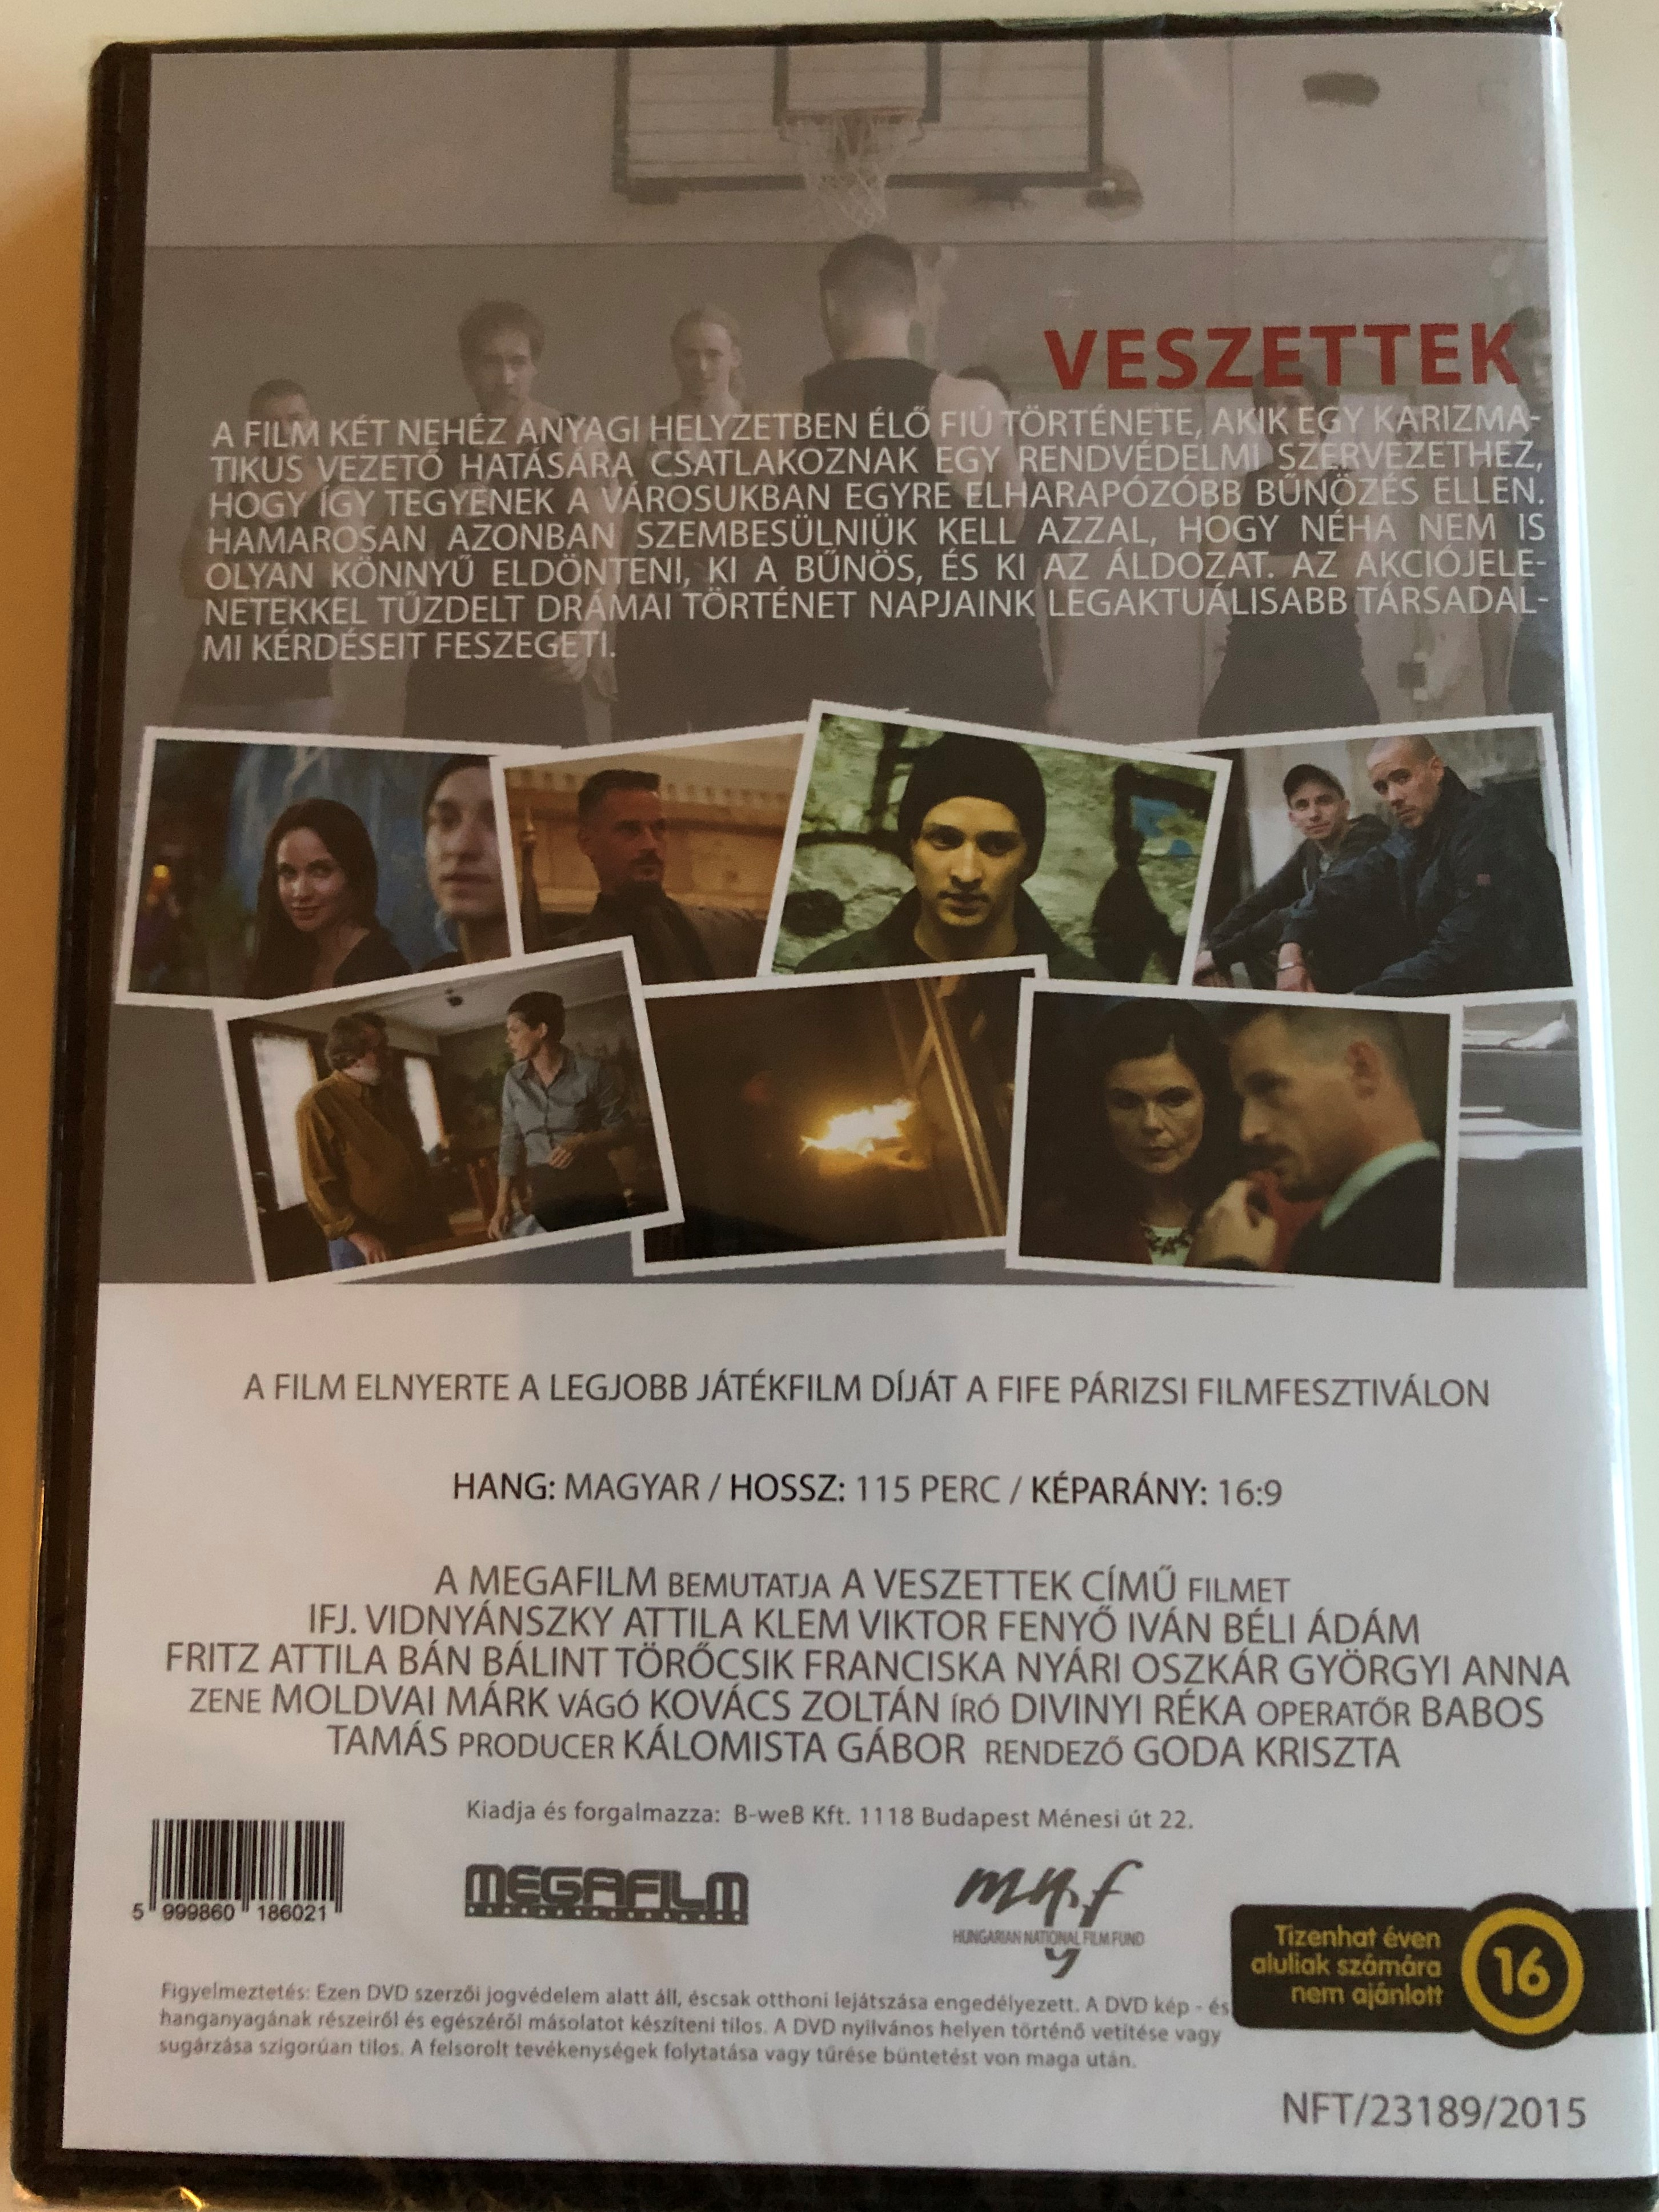 veszettek-dvd-2015-home-guards-directed-by-krisztina-goda-2.jpg